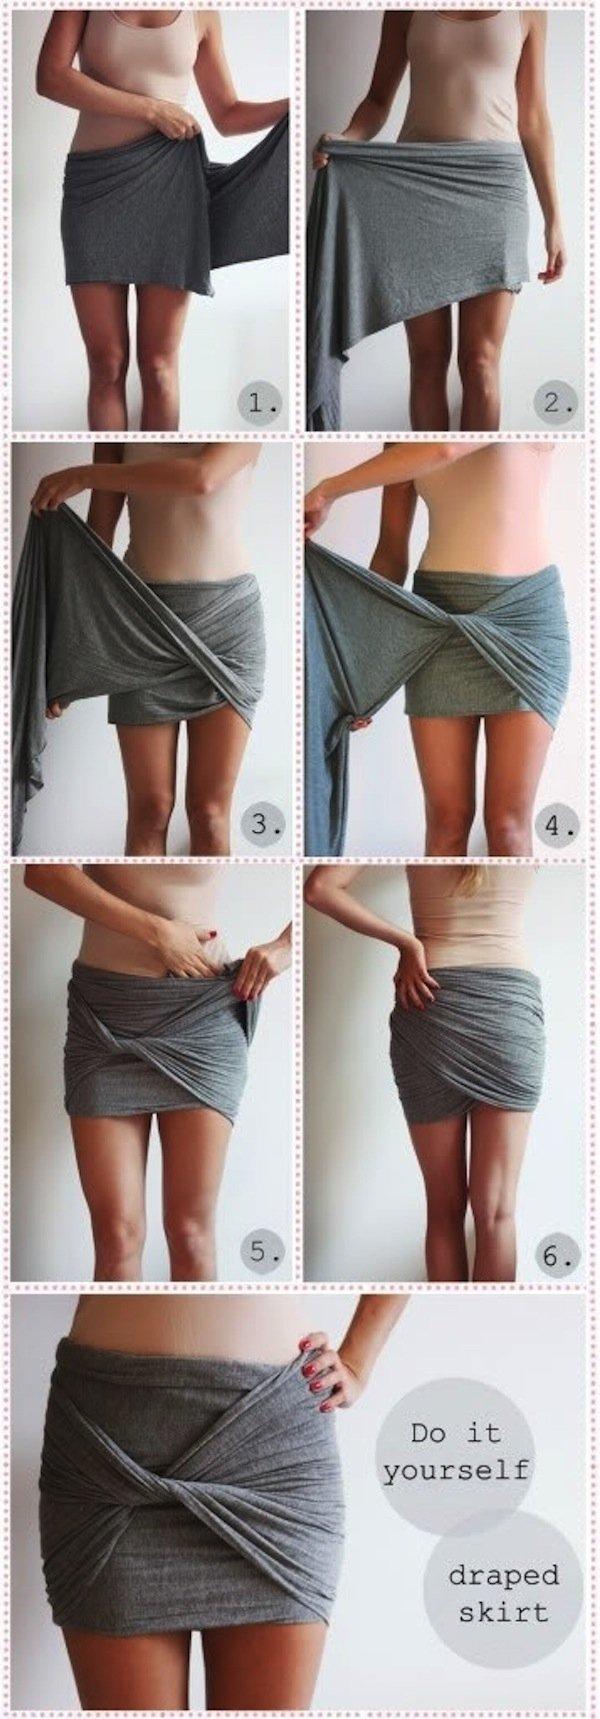 Scarf to Draped Skirt